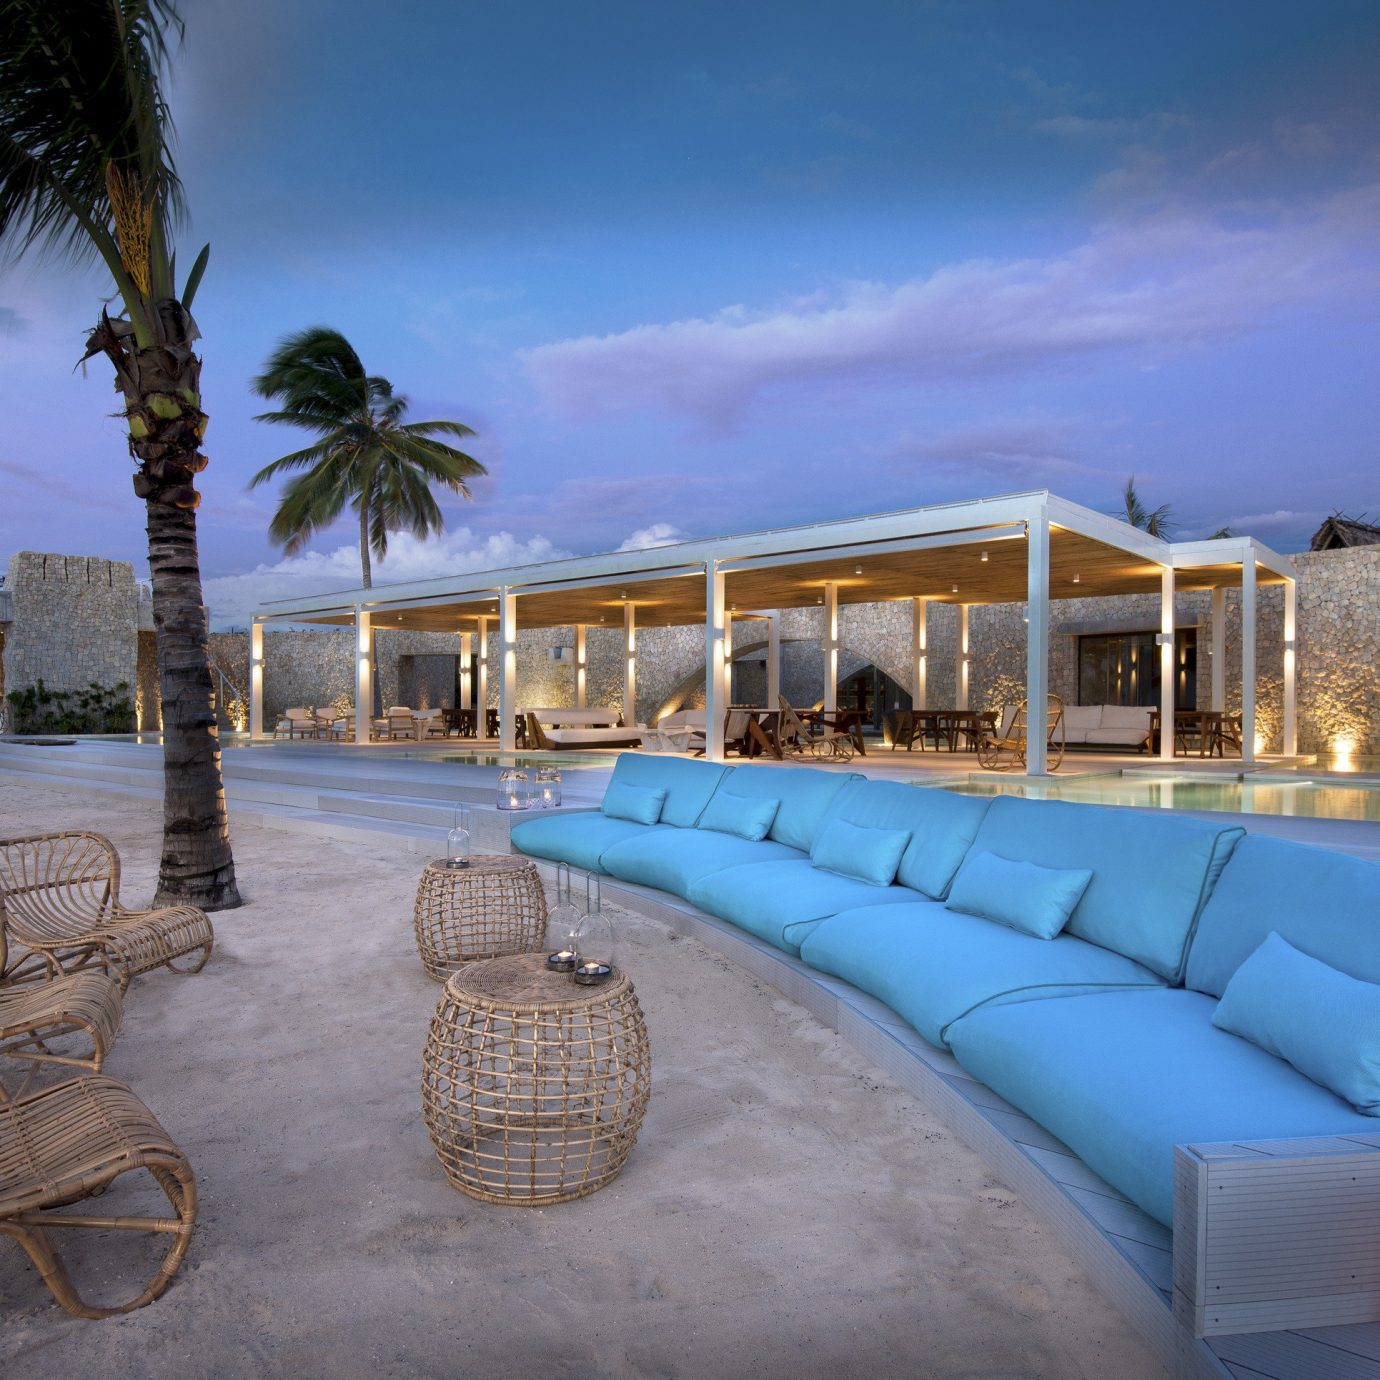 sky Resort property palm tree swimming pool arecales home resort town Villa caribbean leisure evening hacienda tropics lined sandy shore